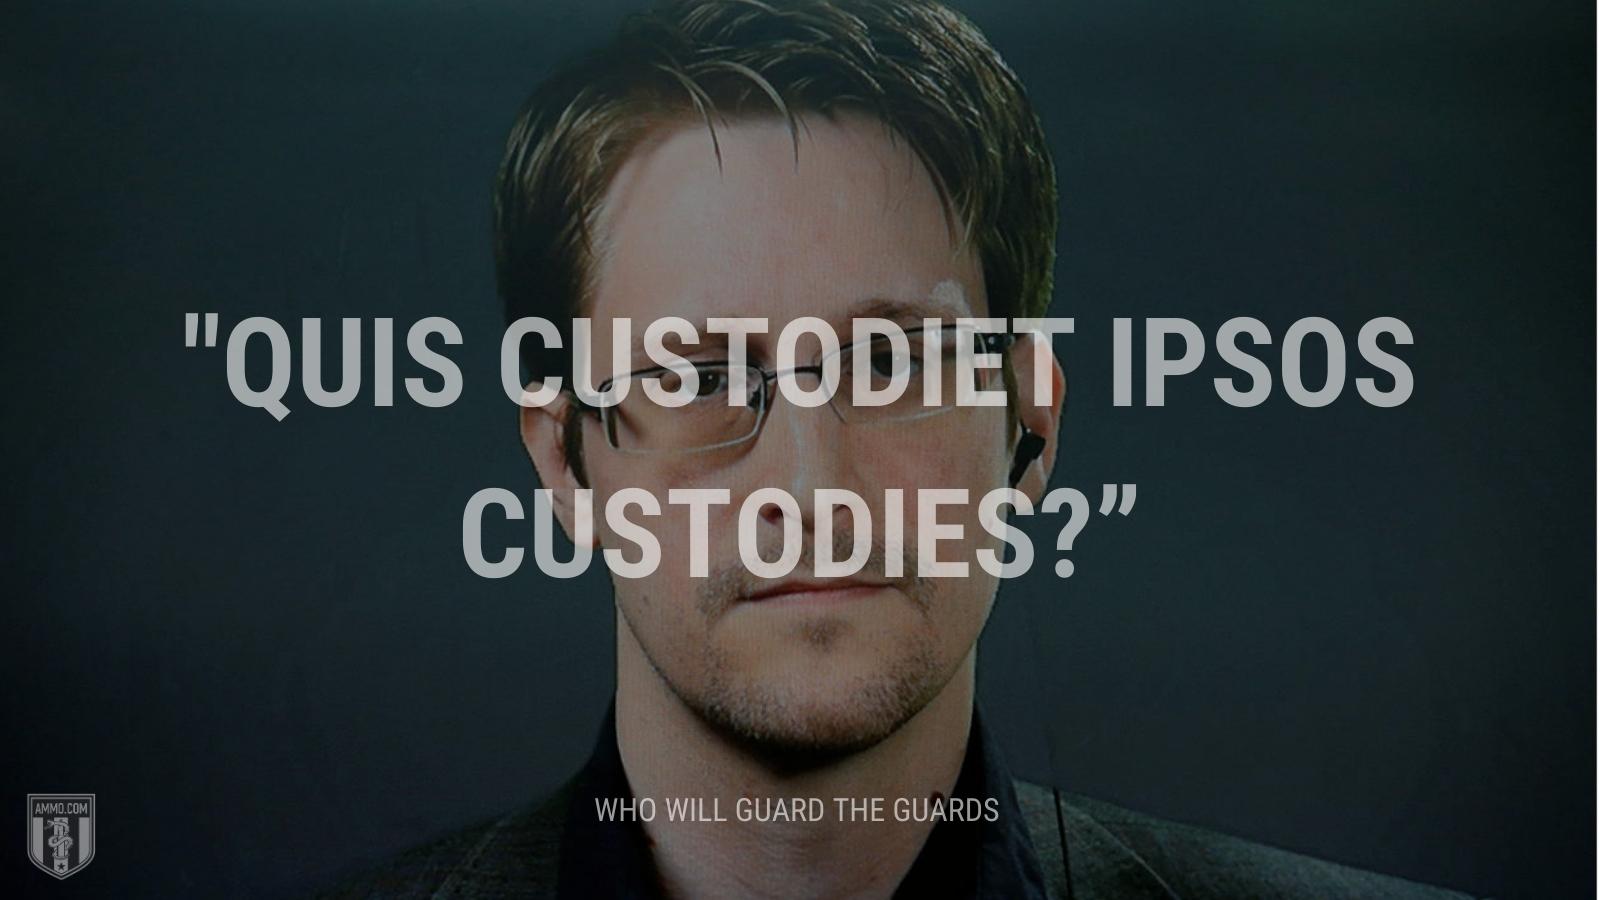 """Quis custodiet ipsos custodies?"" - Who will guard the guards"